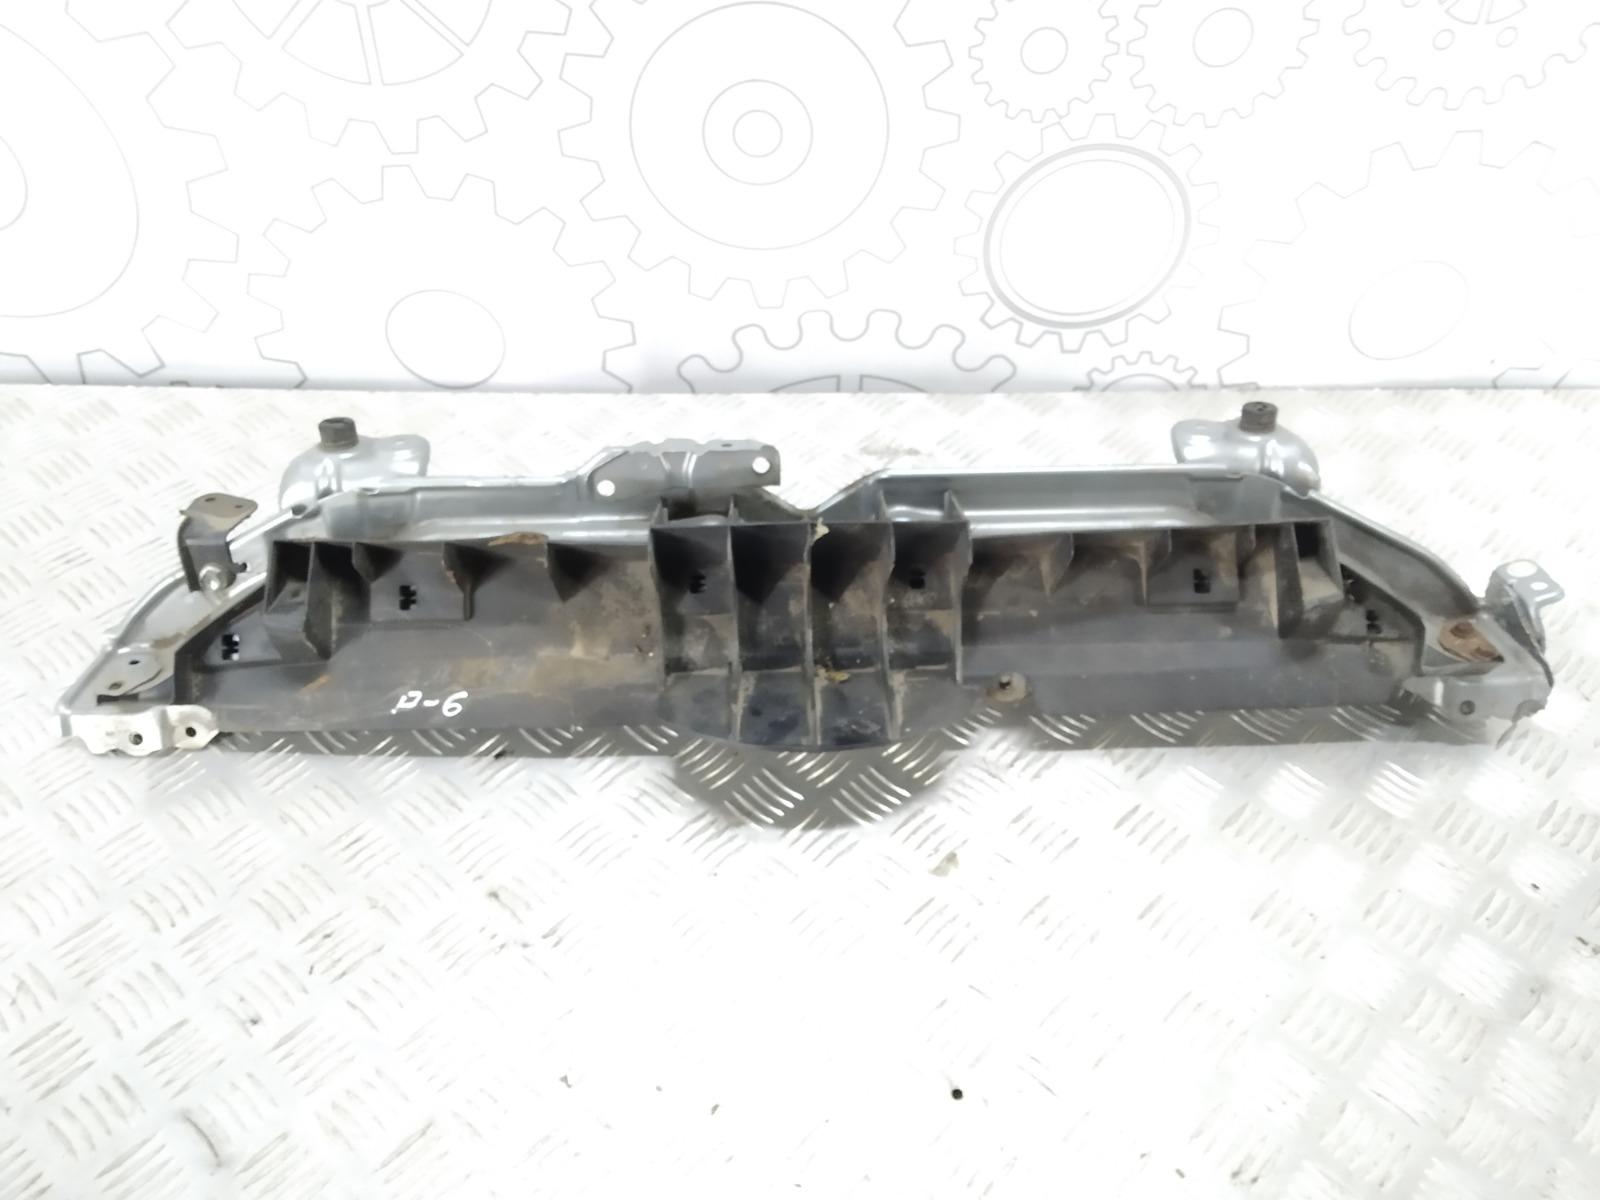 Планка под капот Toyota Yaris XP9 1.4 D-4D 2006 (б/у)